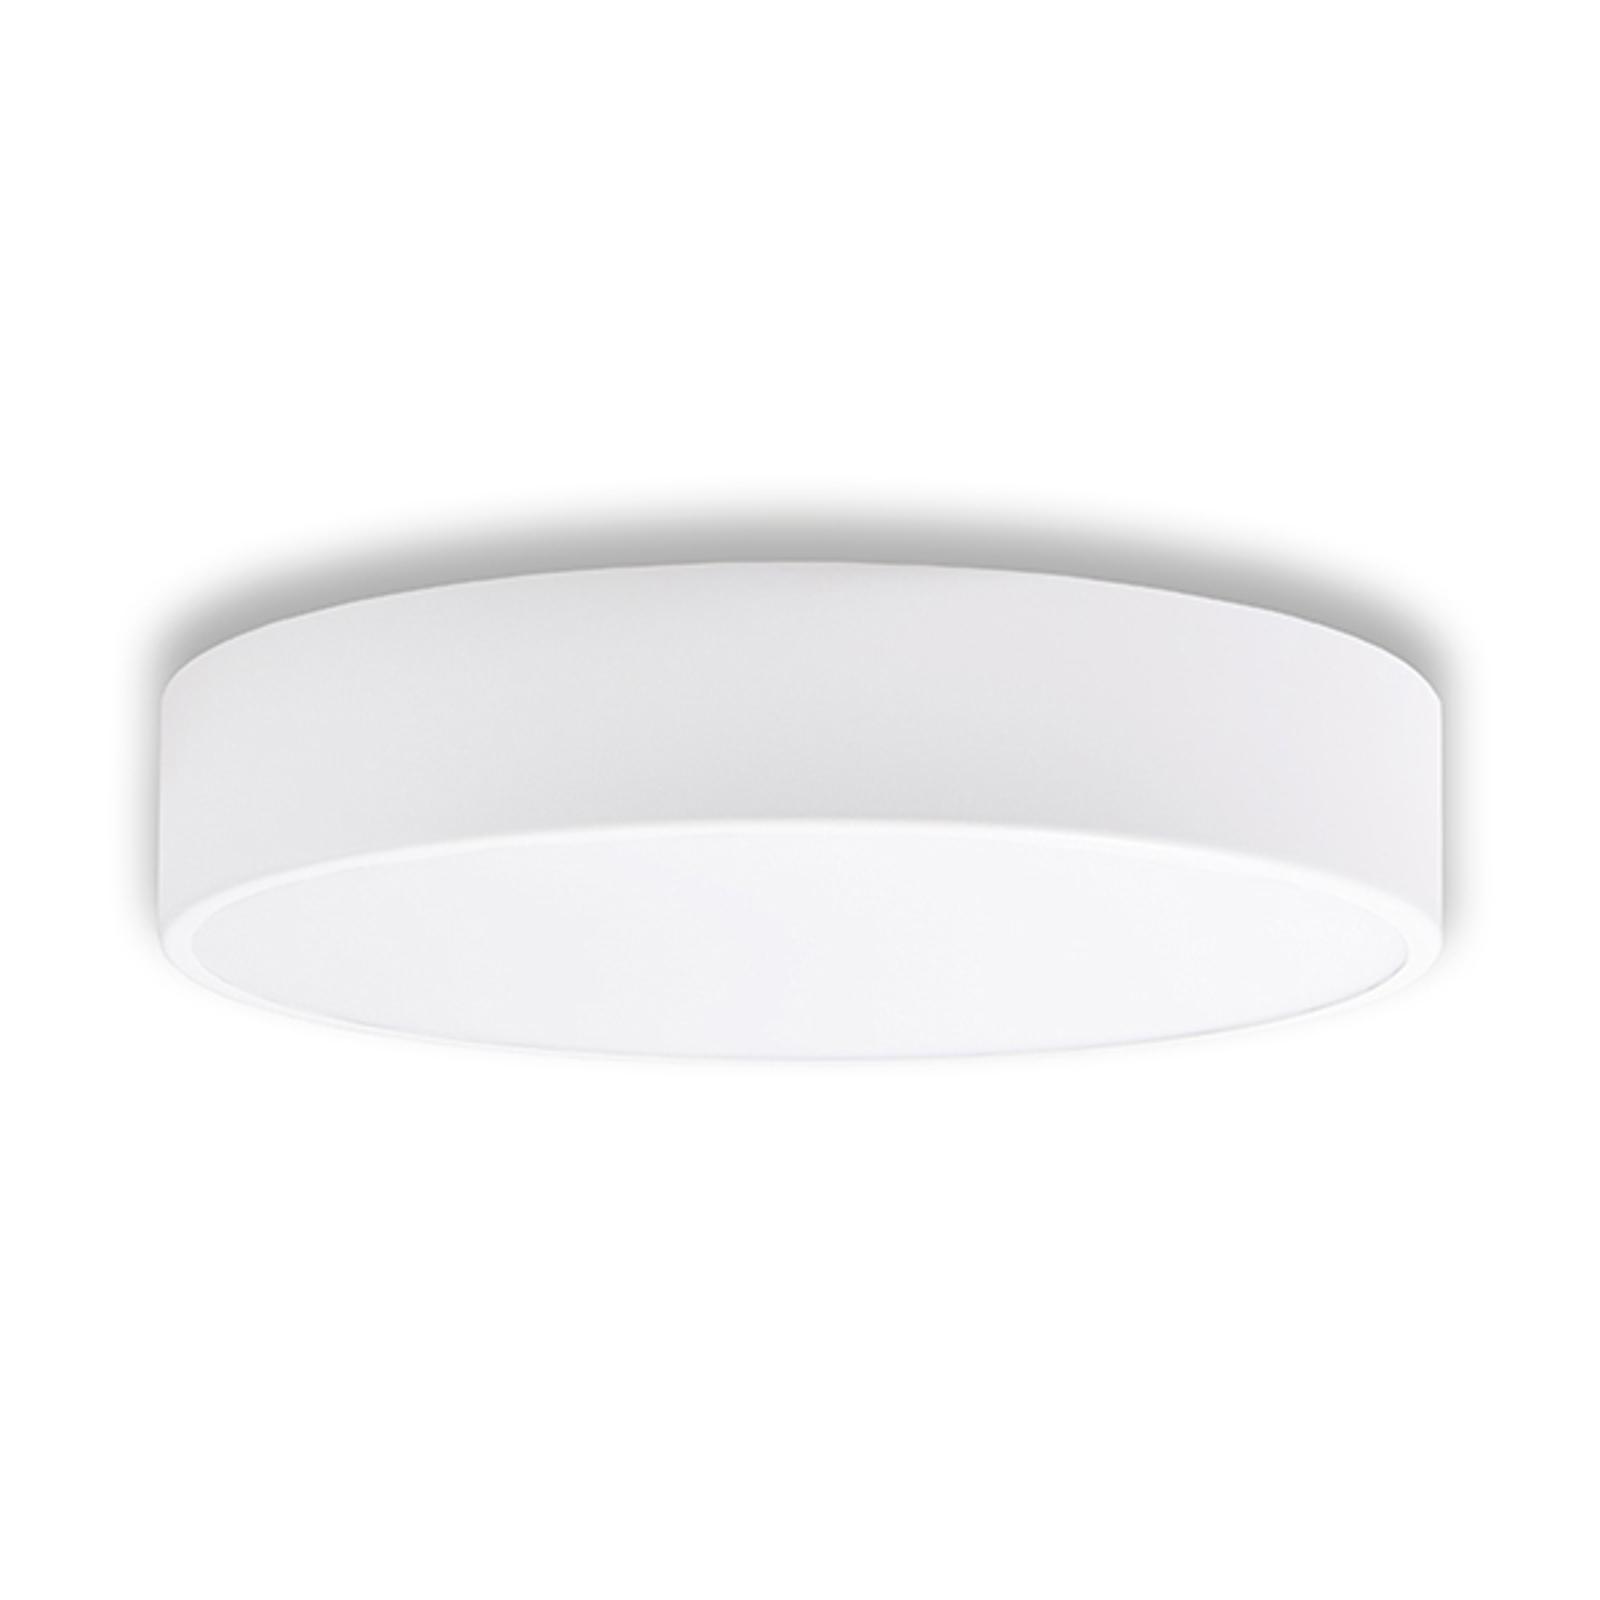 Cleo loftlampe, Ø 40 cm, hvid